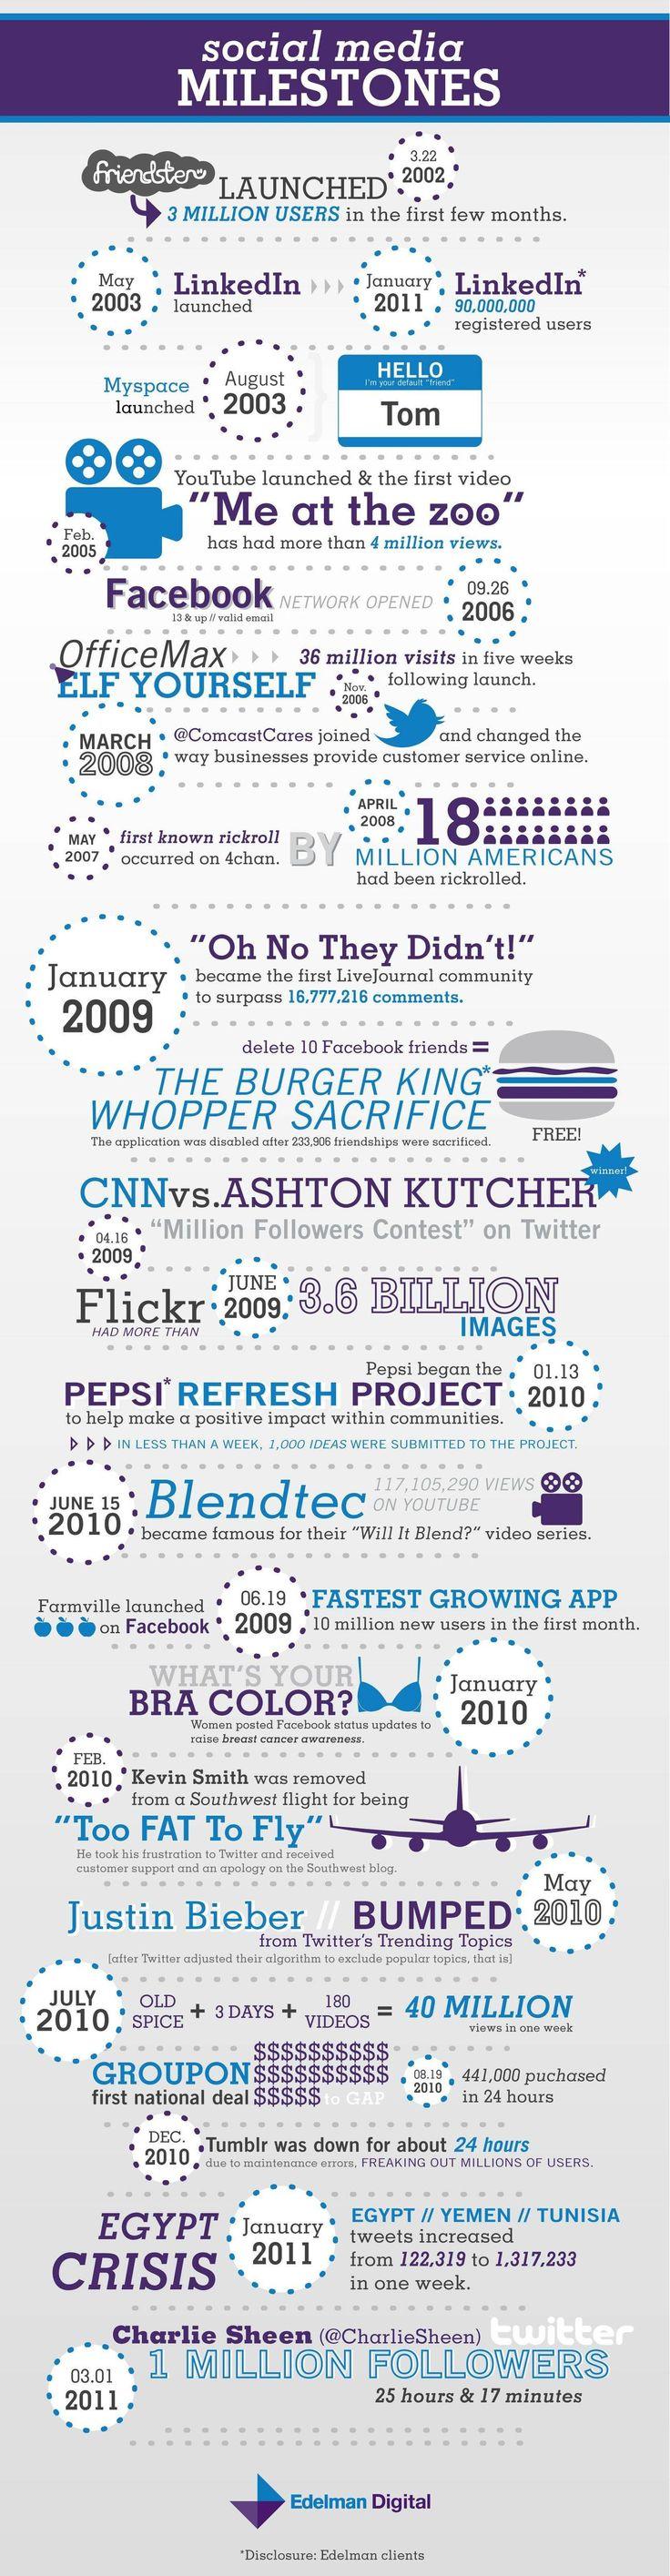 Social Media Milestones: From Friendster to Charlie Sheen.